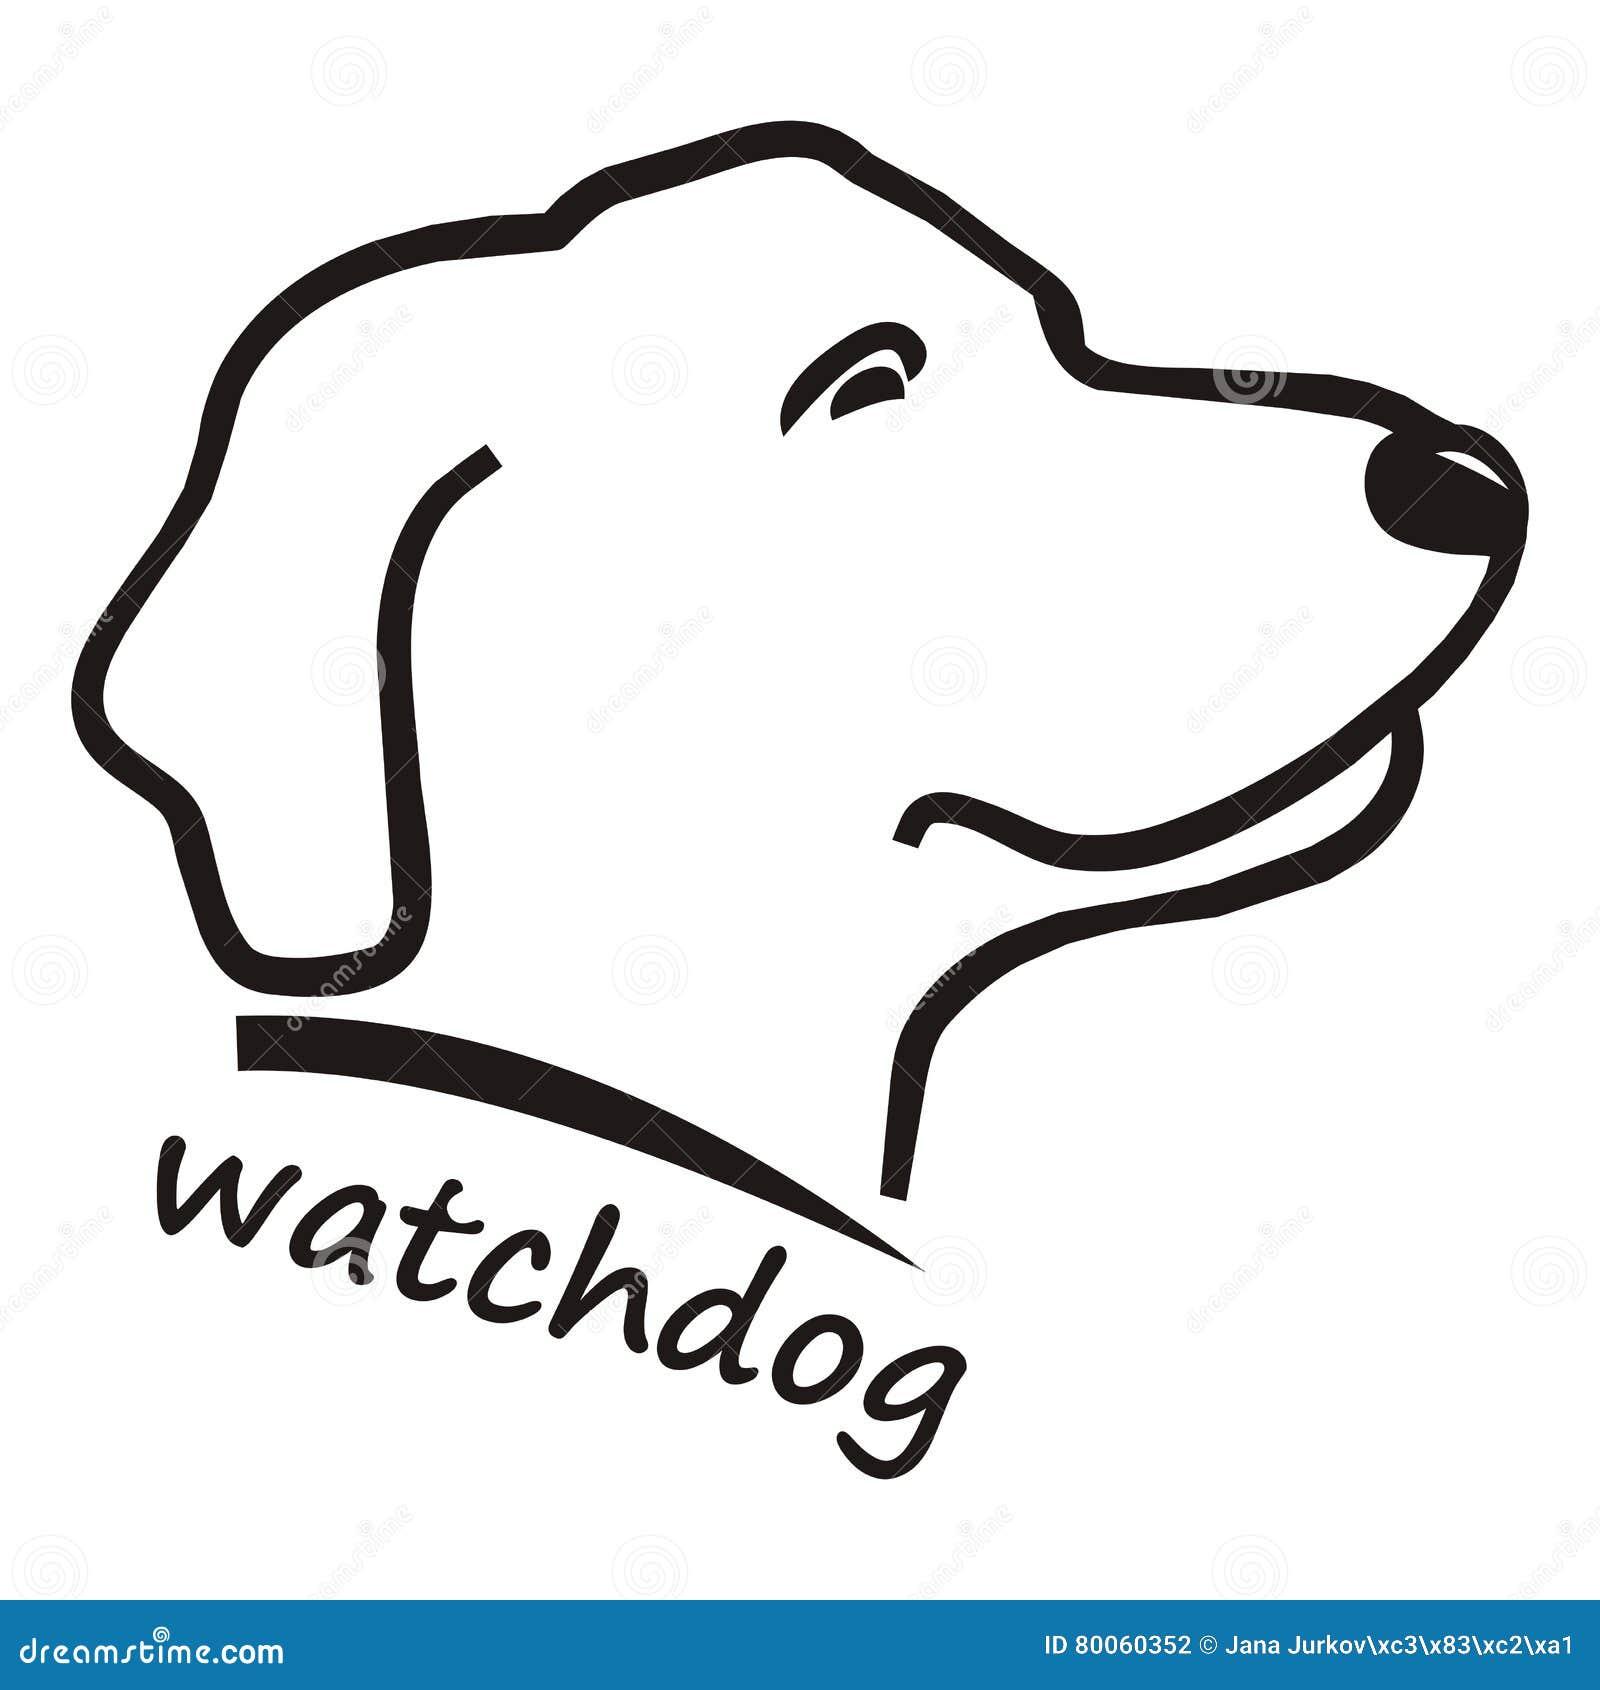 watchdog cartoons  illustrations  u0026 vector stock images